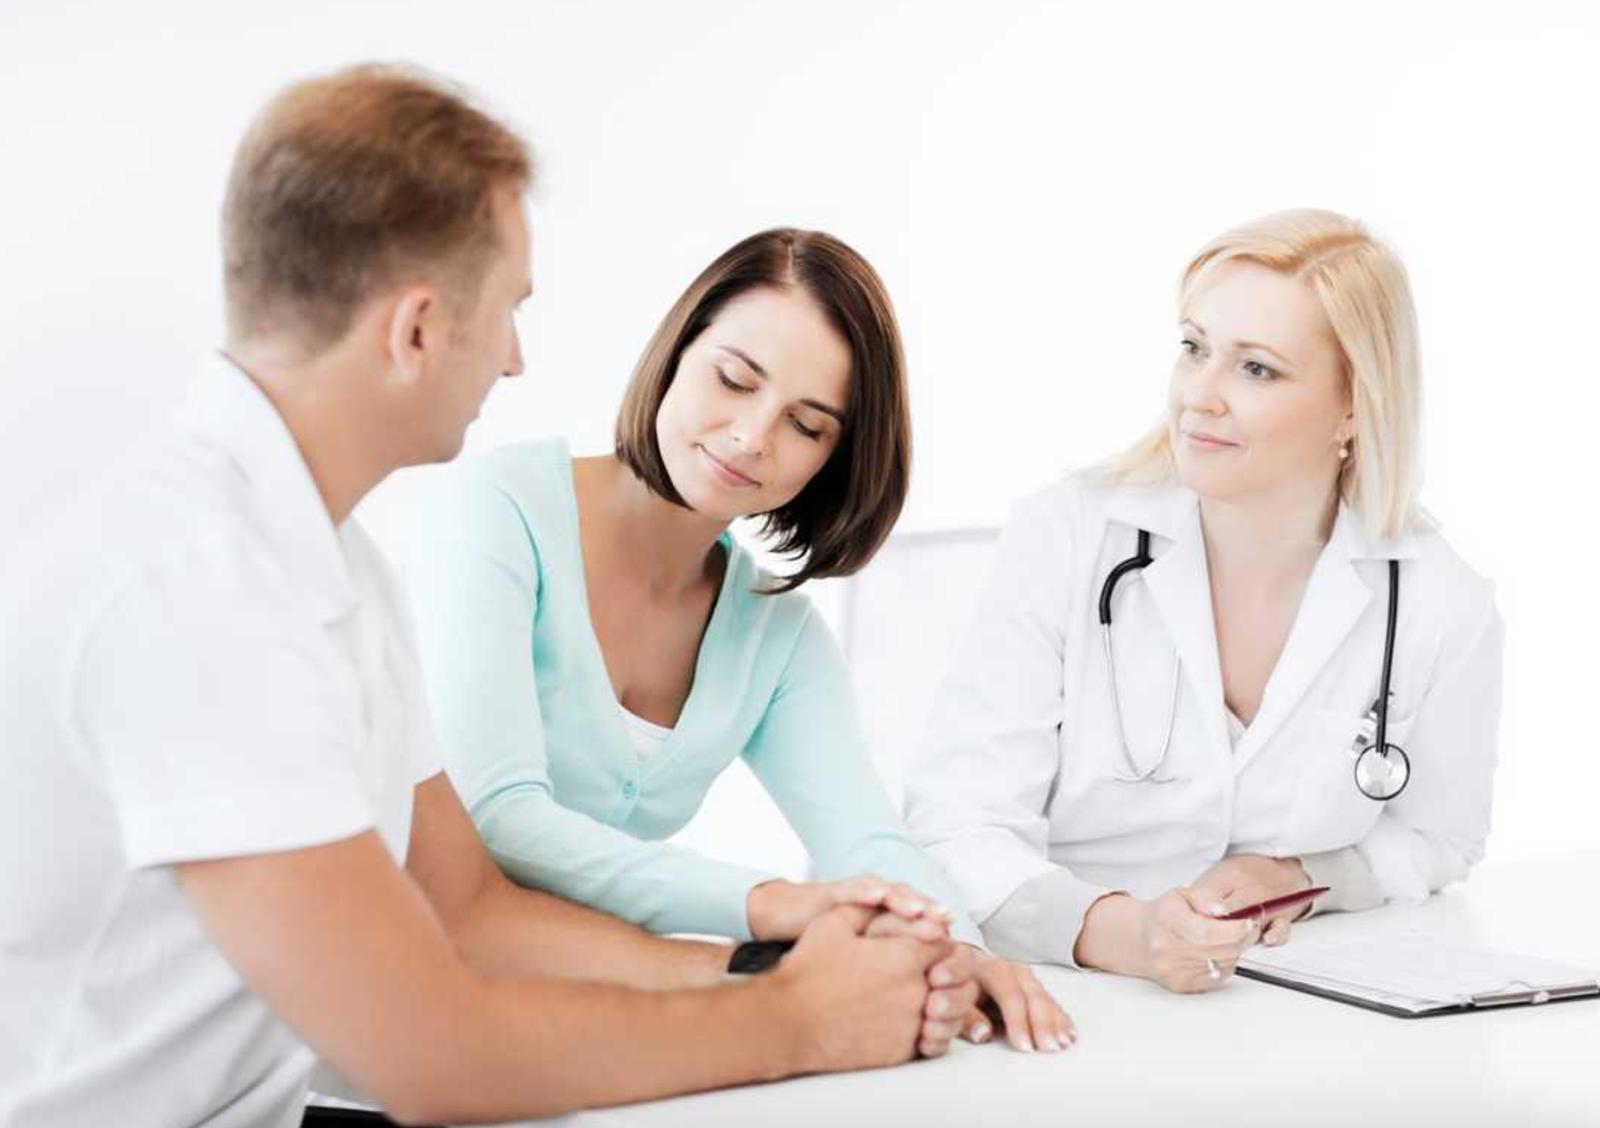 Mesothelioma lawsuit - What Does Mesothelioma Lawsuit Mean